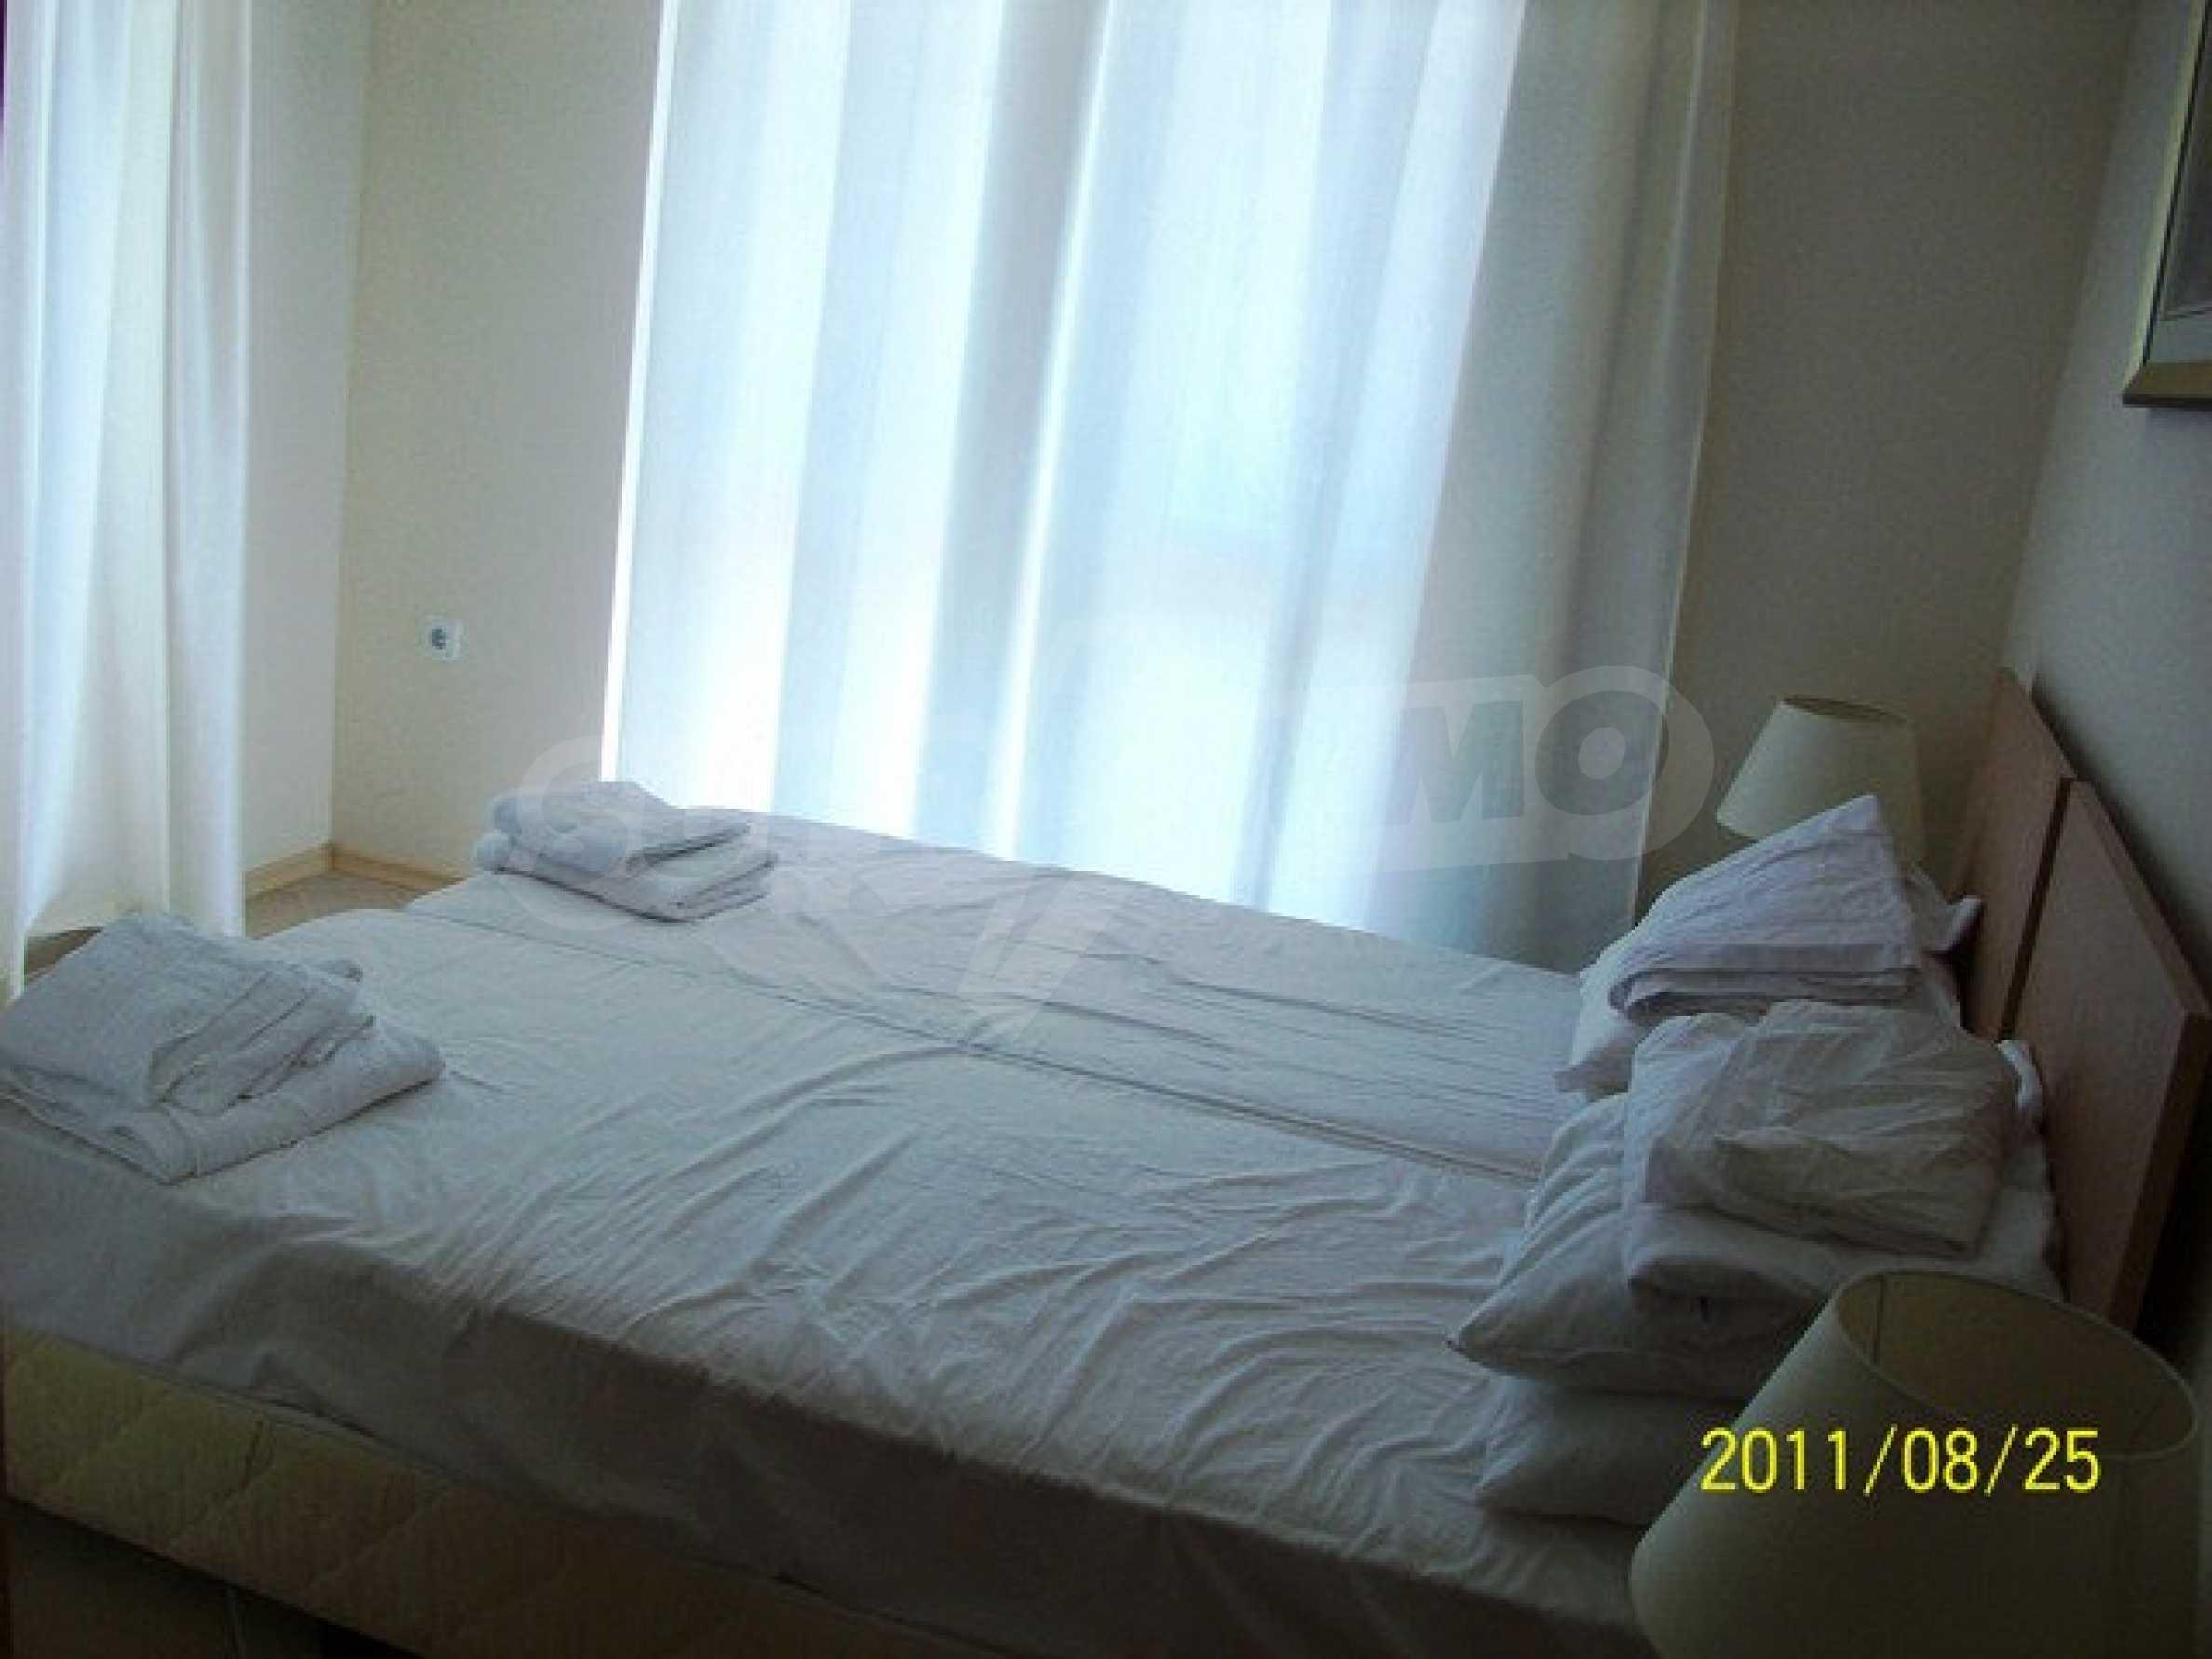 Трехкомнатный апартамент на продажу в комплексе Emberli в курорте Лозенец 20